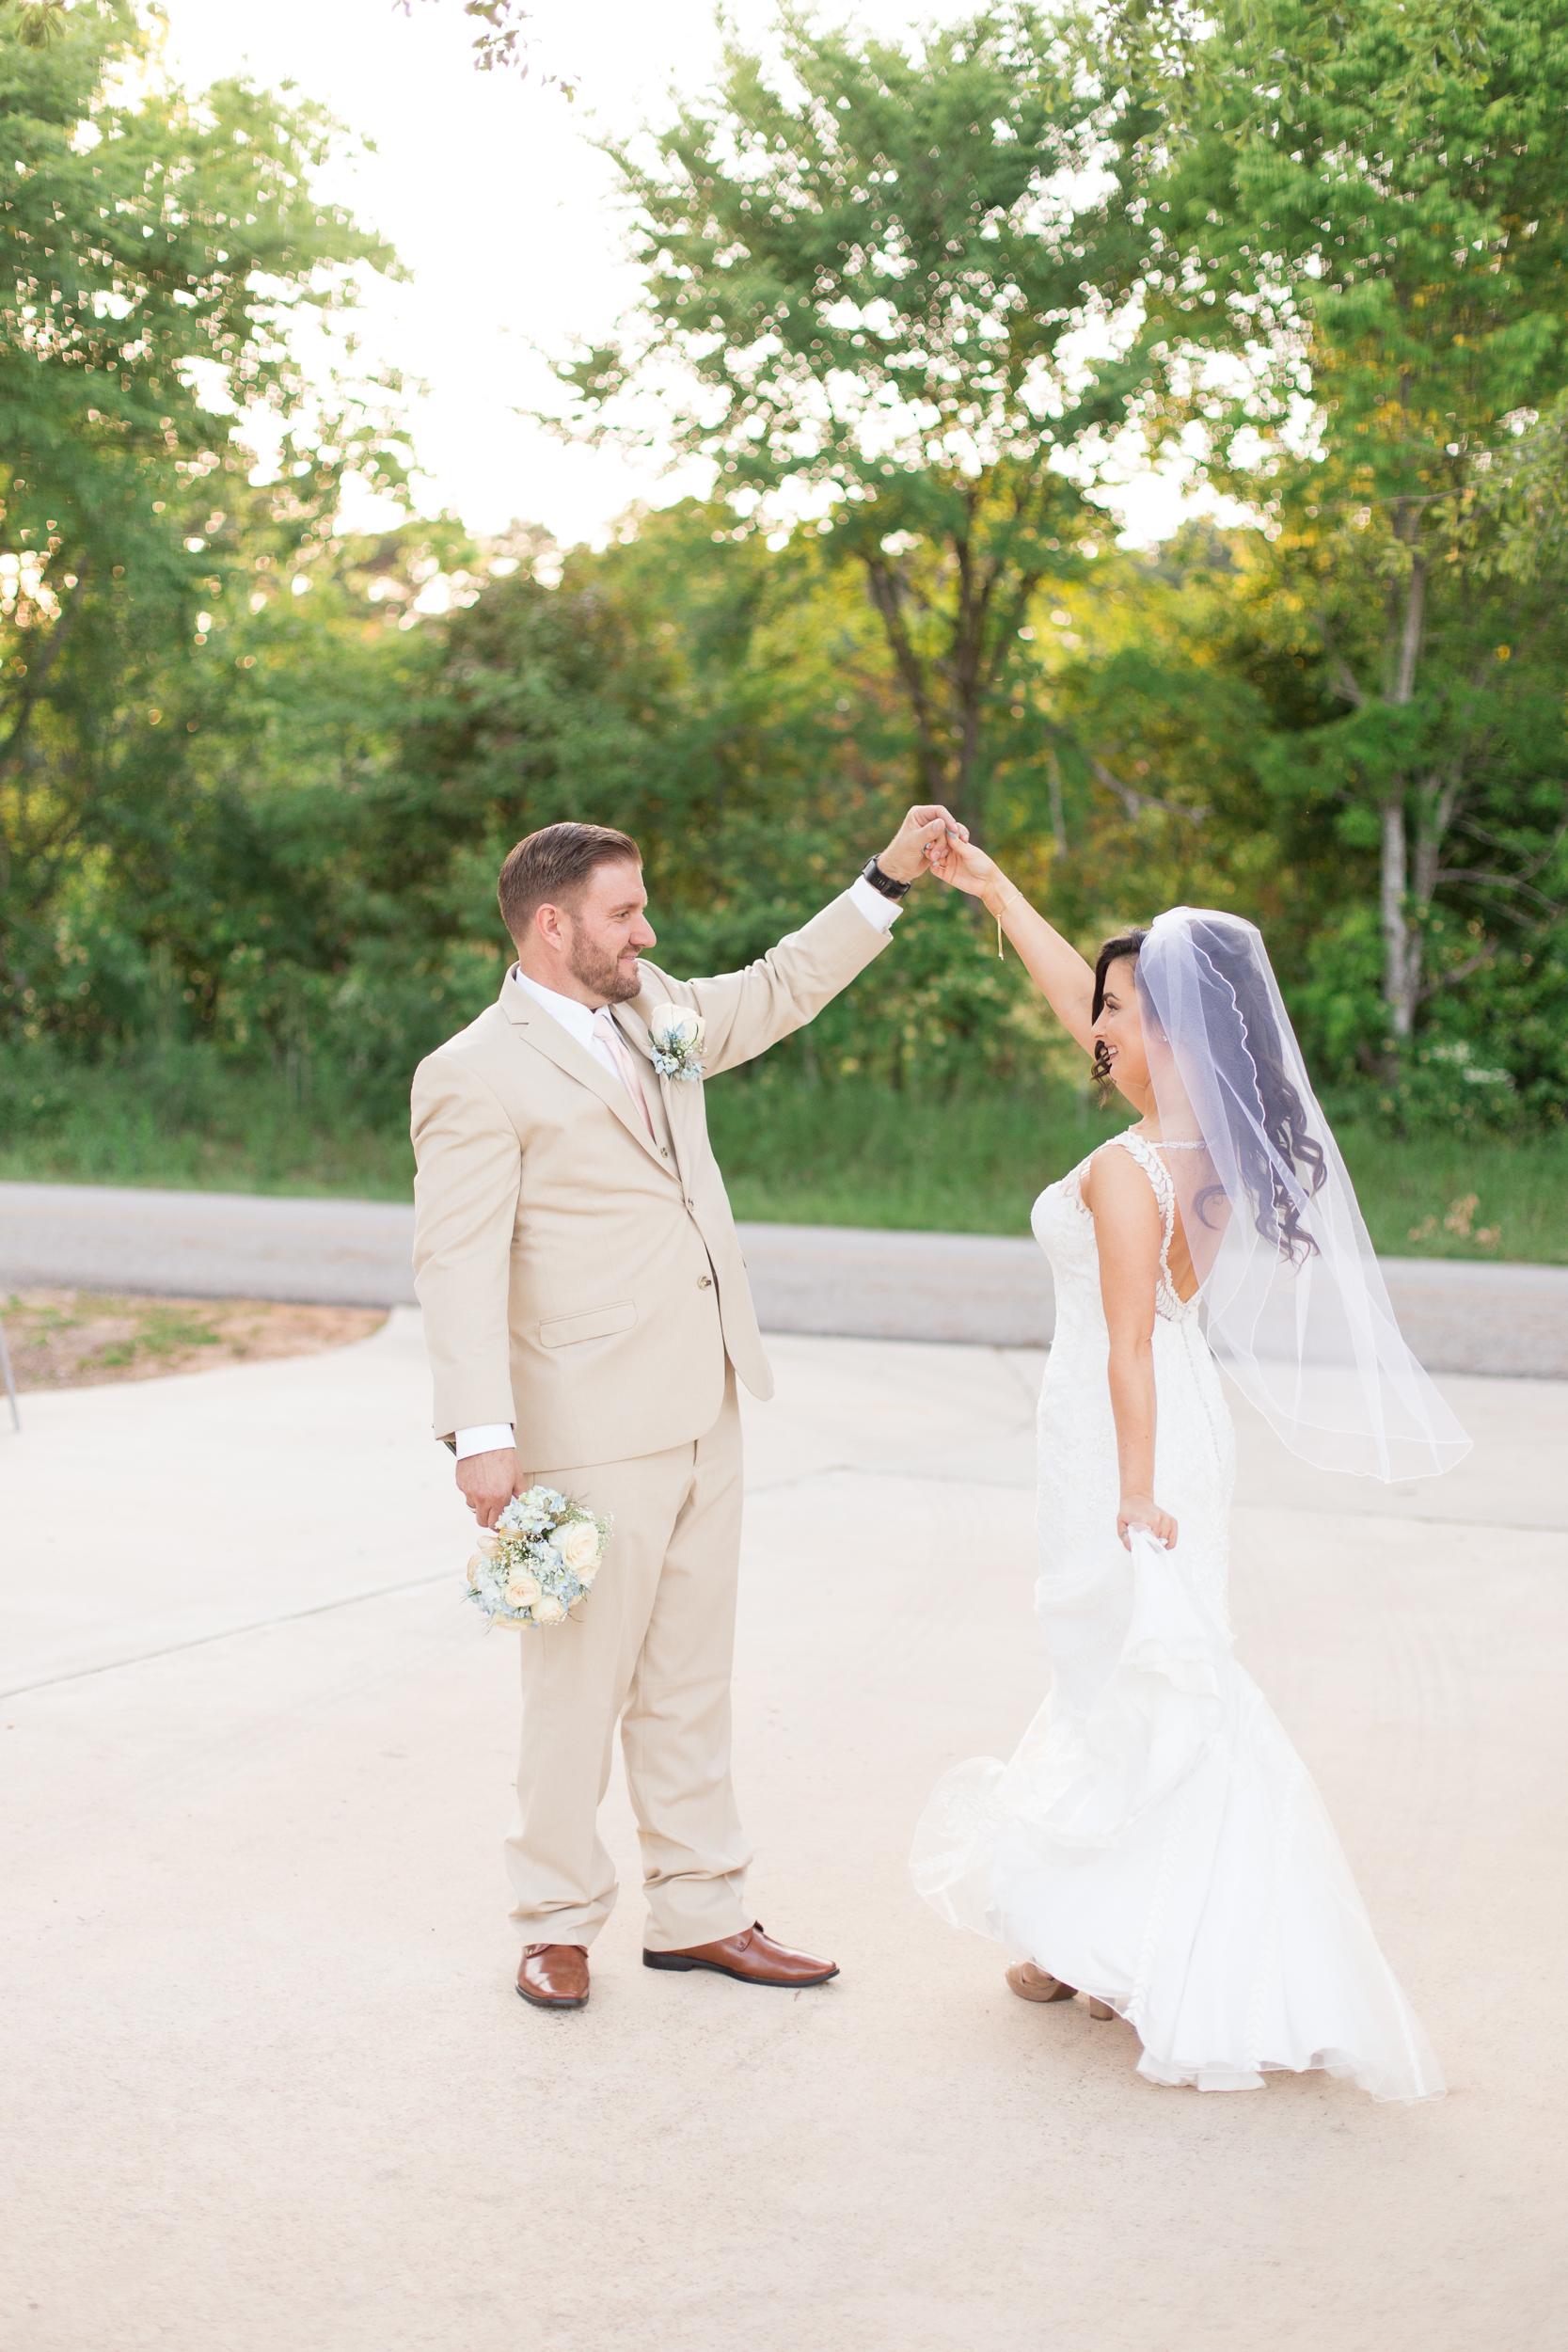 Zihlman-East TX Wedding_Kelsie Hendricks Photography_The Folmar Tyler Texas-123.jpg